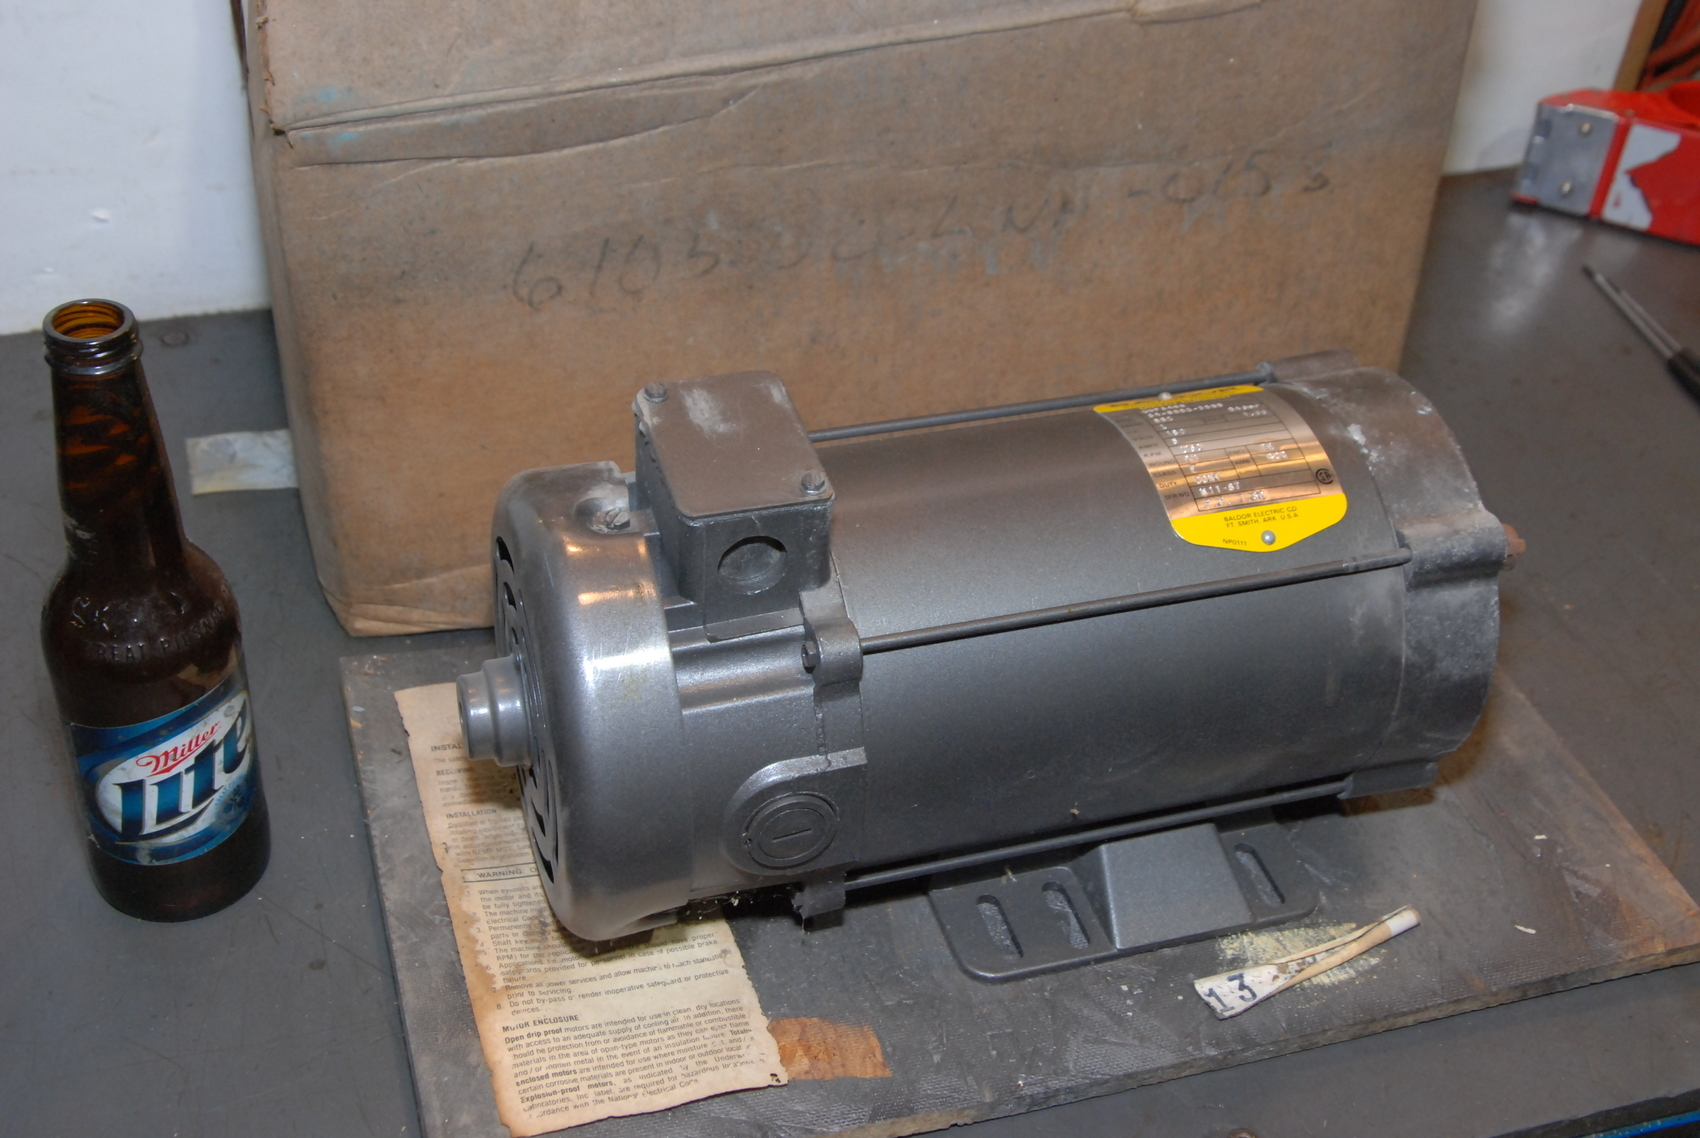 NEW Baldor industrial motor CDP3455,1hp,1750 rpm,180V